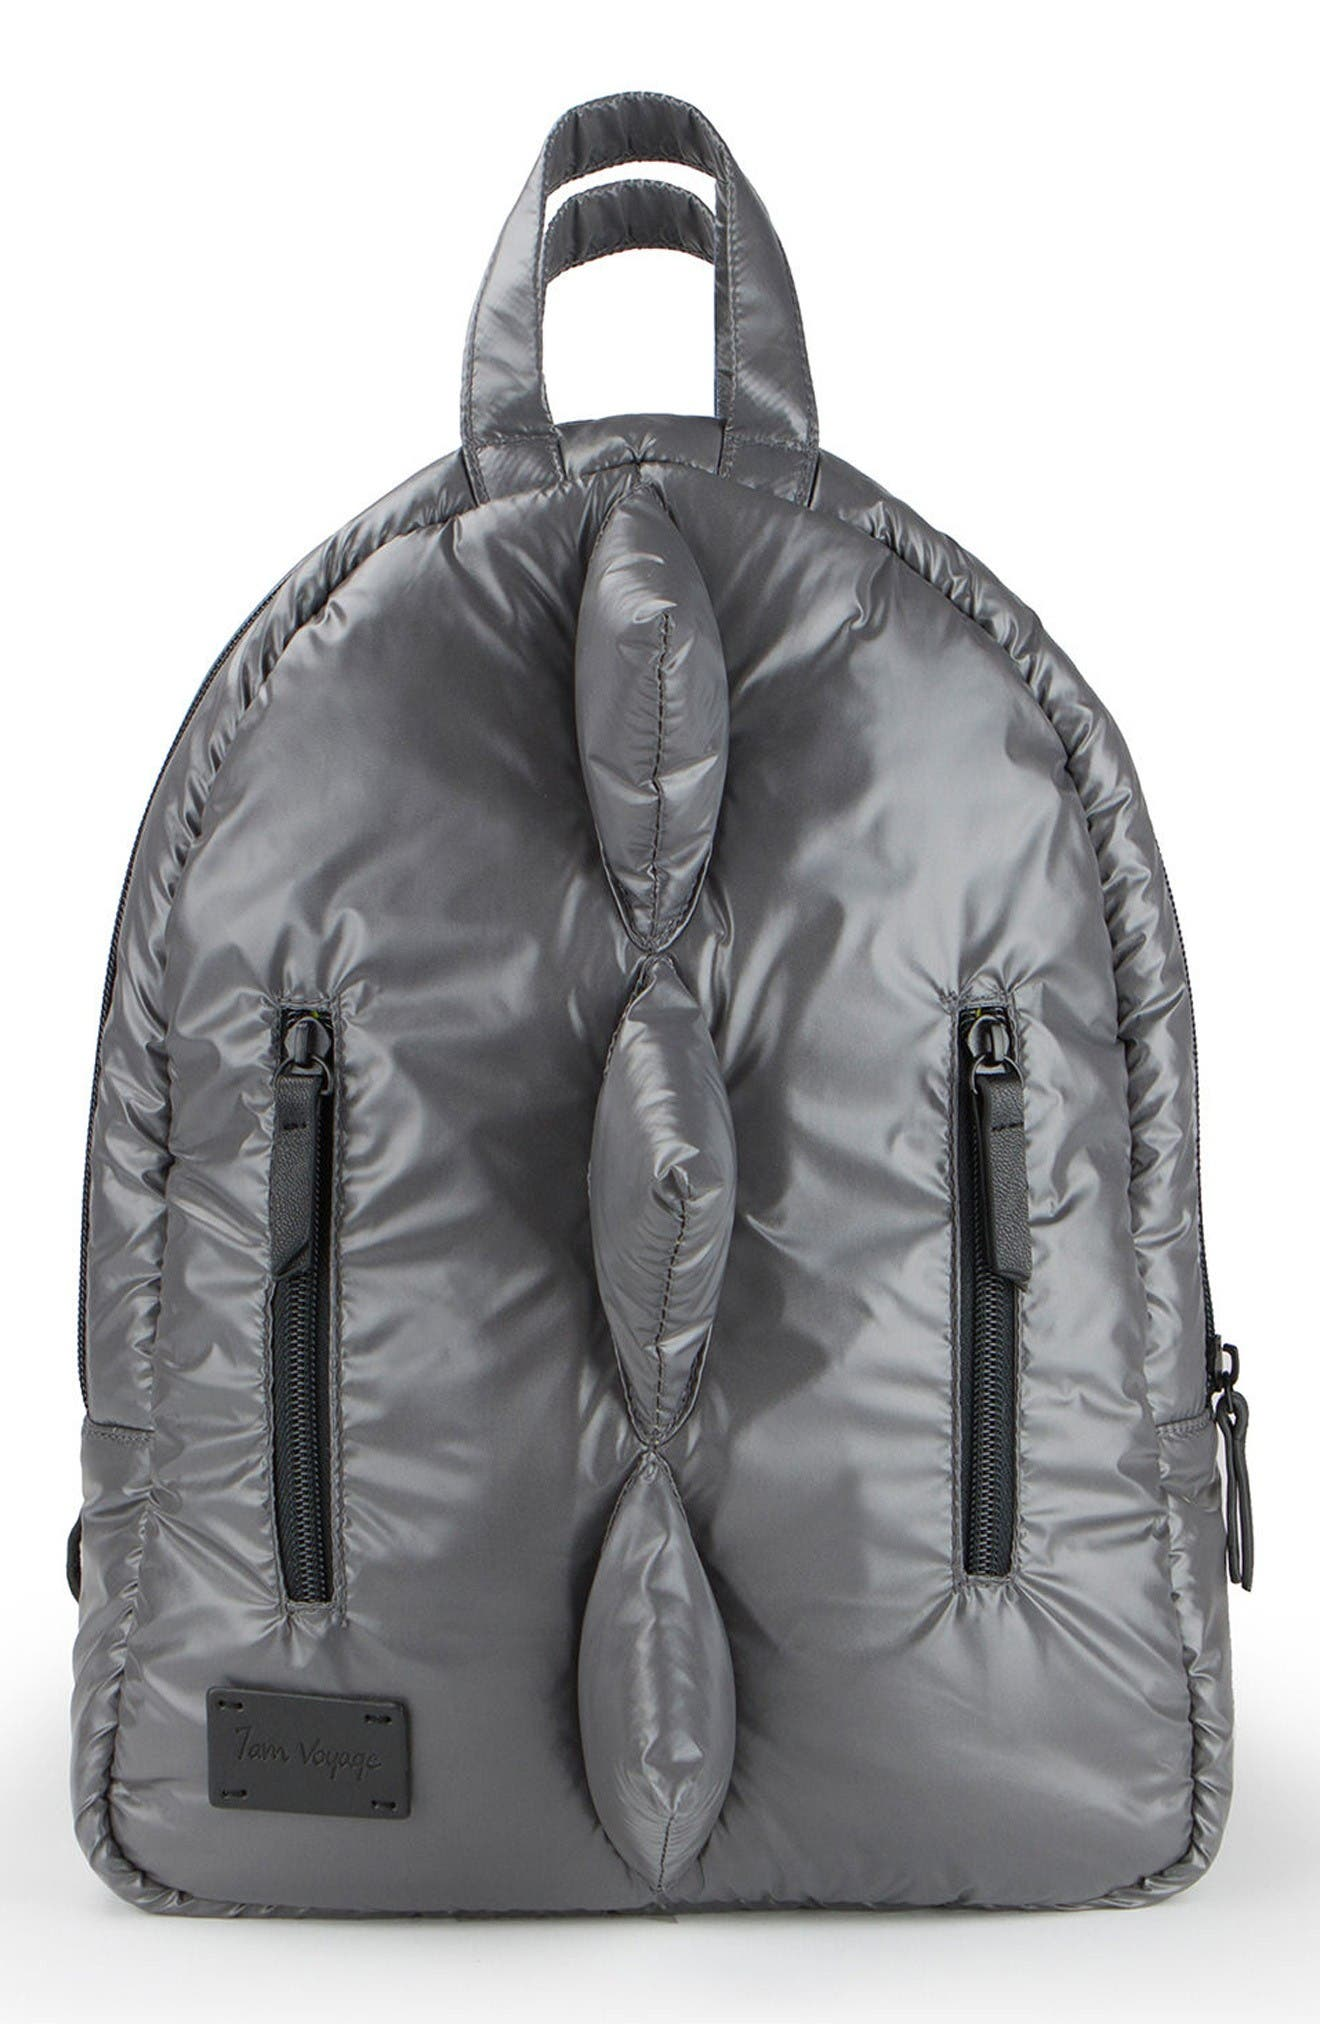 7 A.M. Enfant Dino Water Repellent Mini Backpack (Kids)